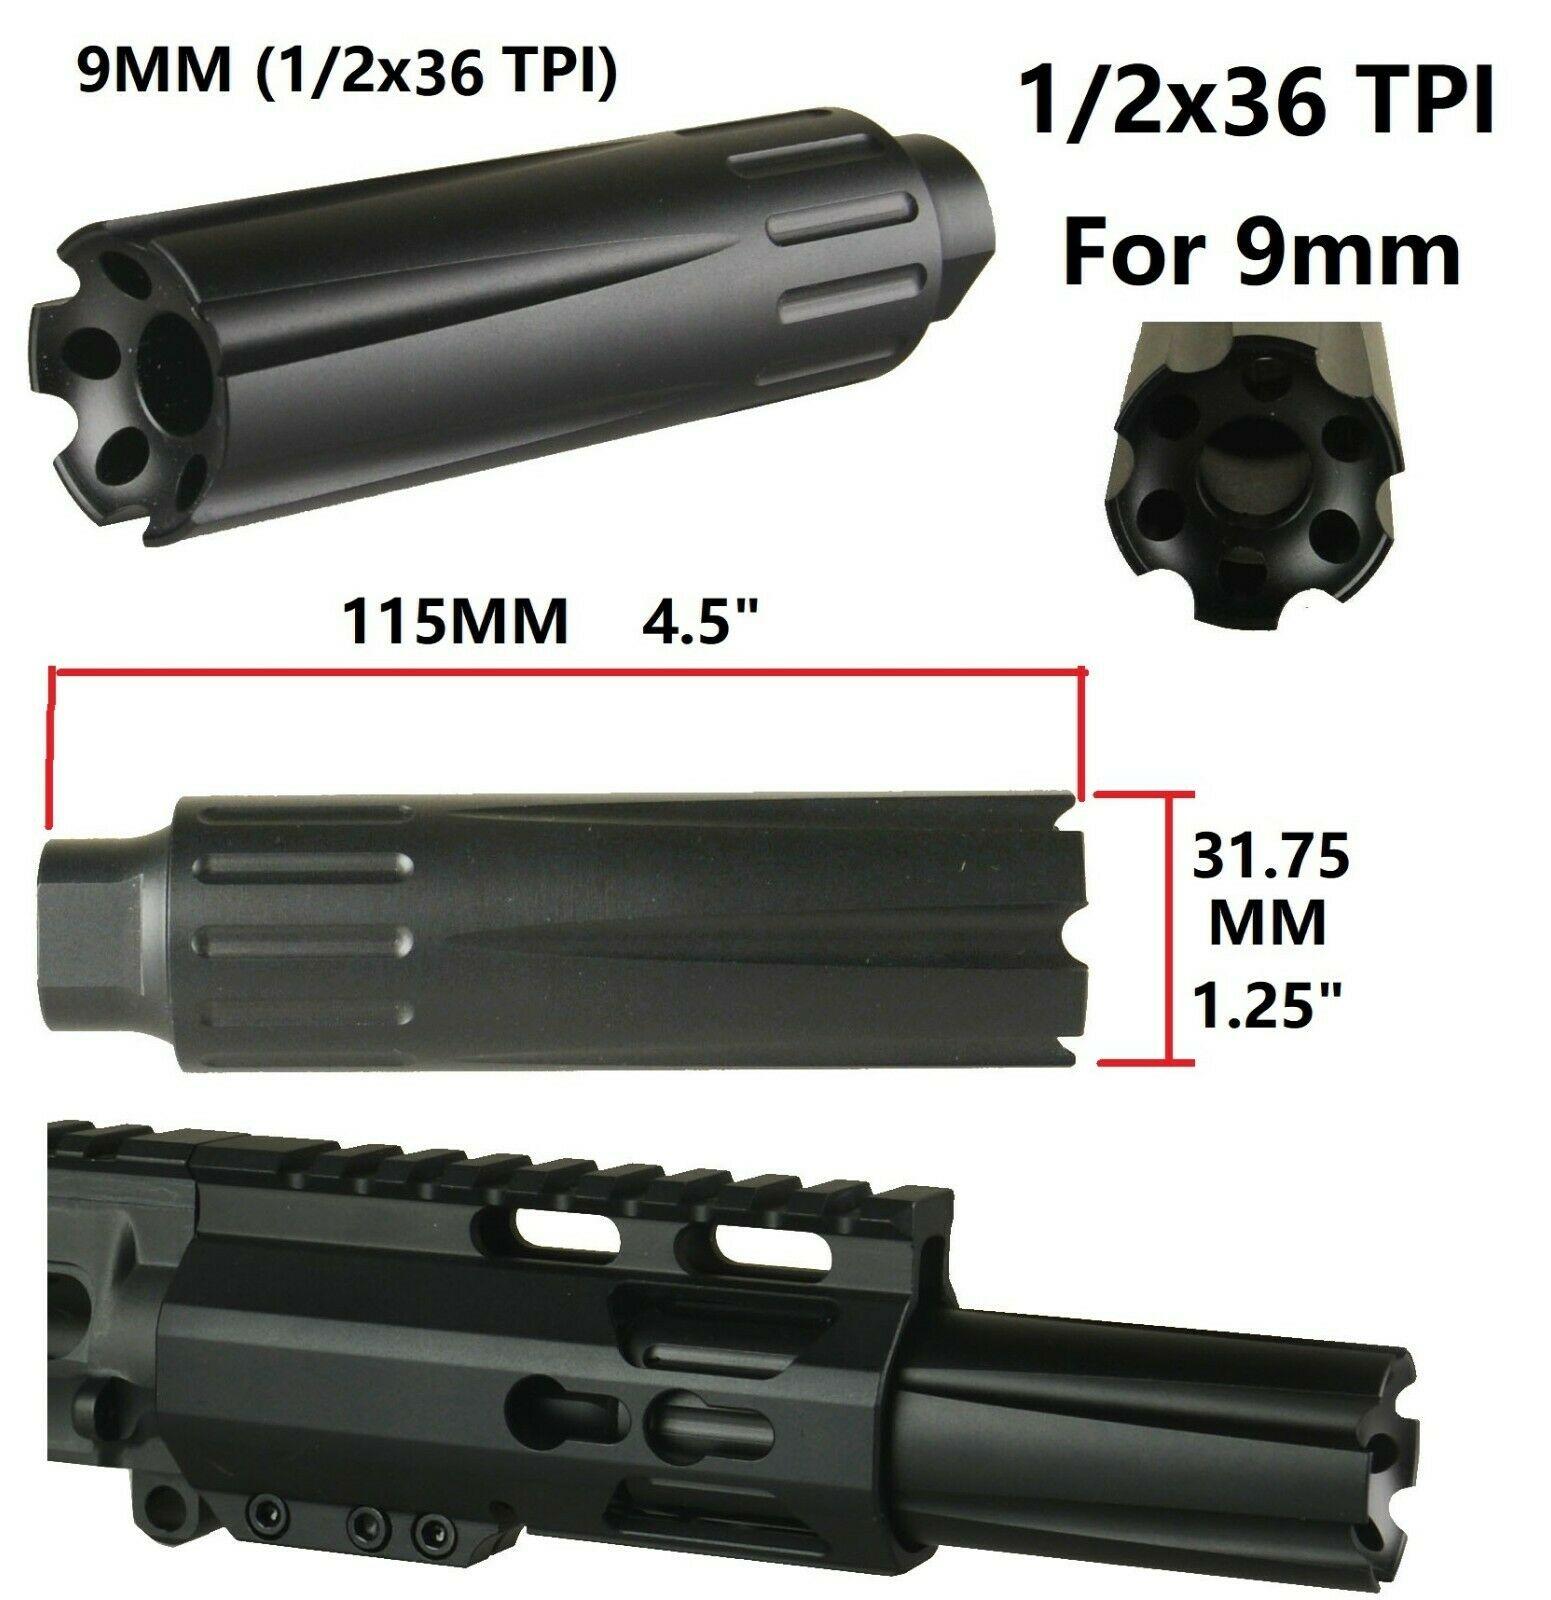 Black Anodized Aluminum Ultra Light 9mm Muzzle Brake Compensator 1//2x36 TPI